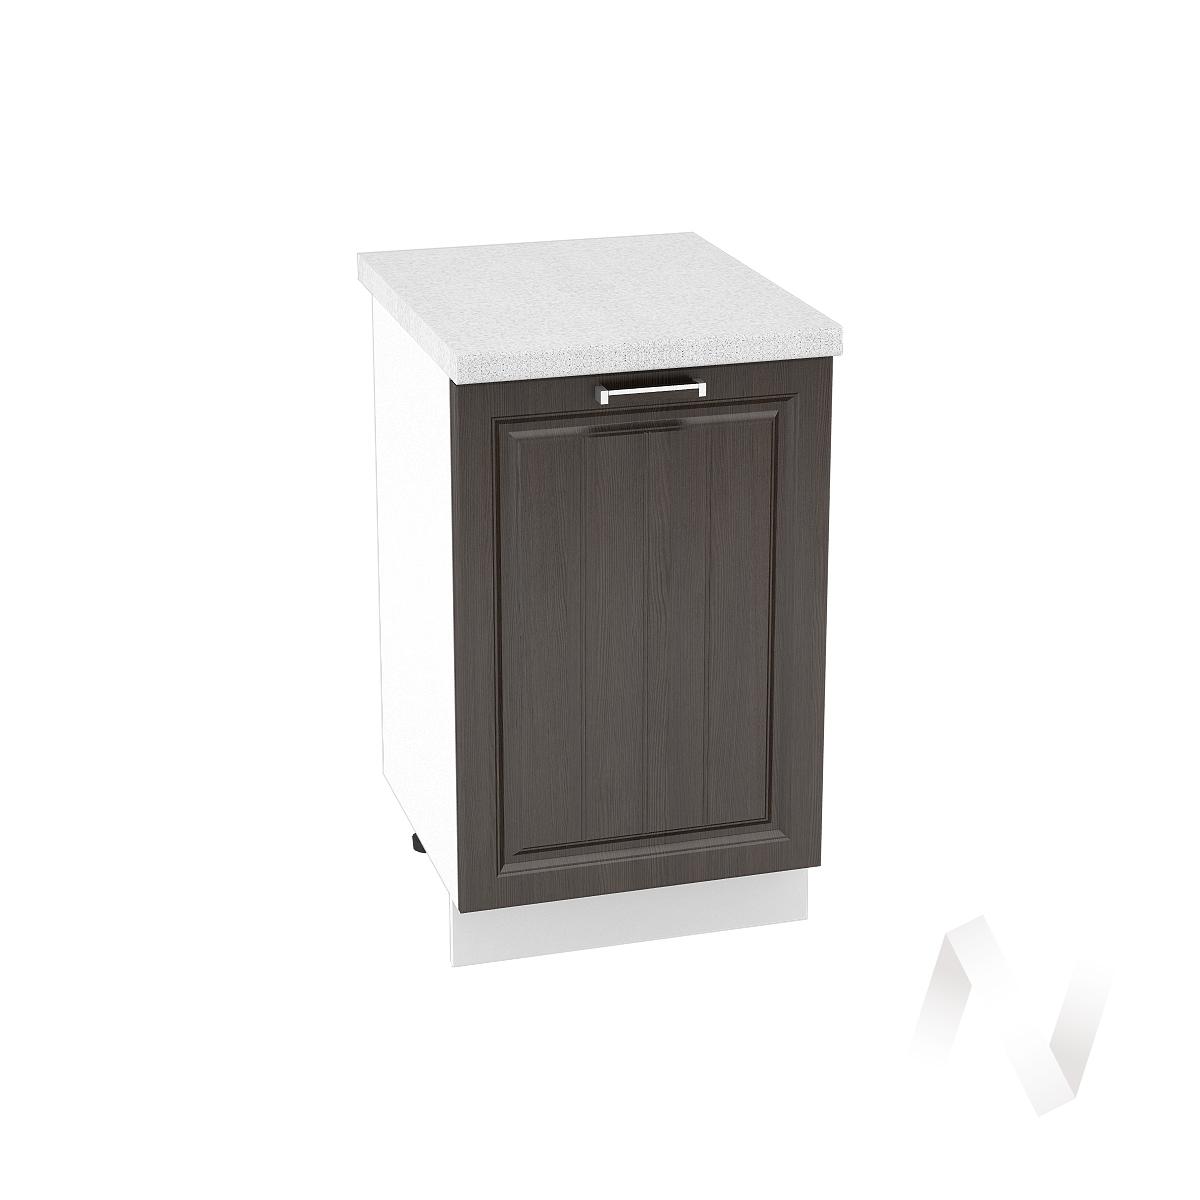 "Кухня ""Прага"": Шкаф нижний 500, ШН 500 (венге/корпус белый)"